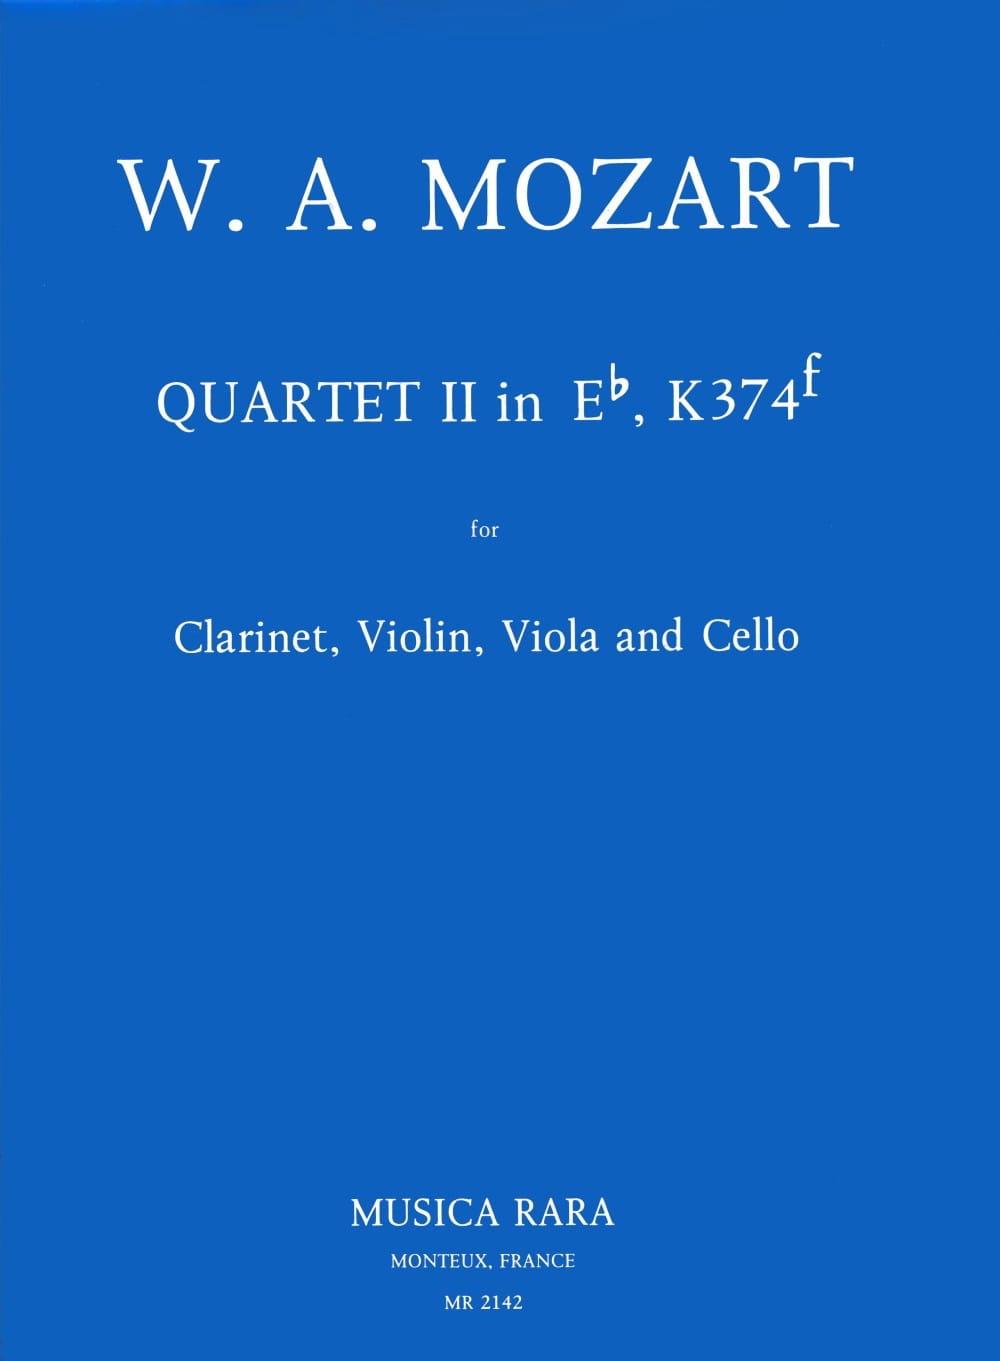 Quartet n° 2 in Eb, KV 374f -Clarinet violin viola cello - laflutedepan.com